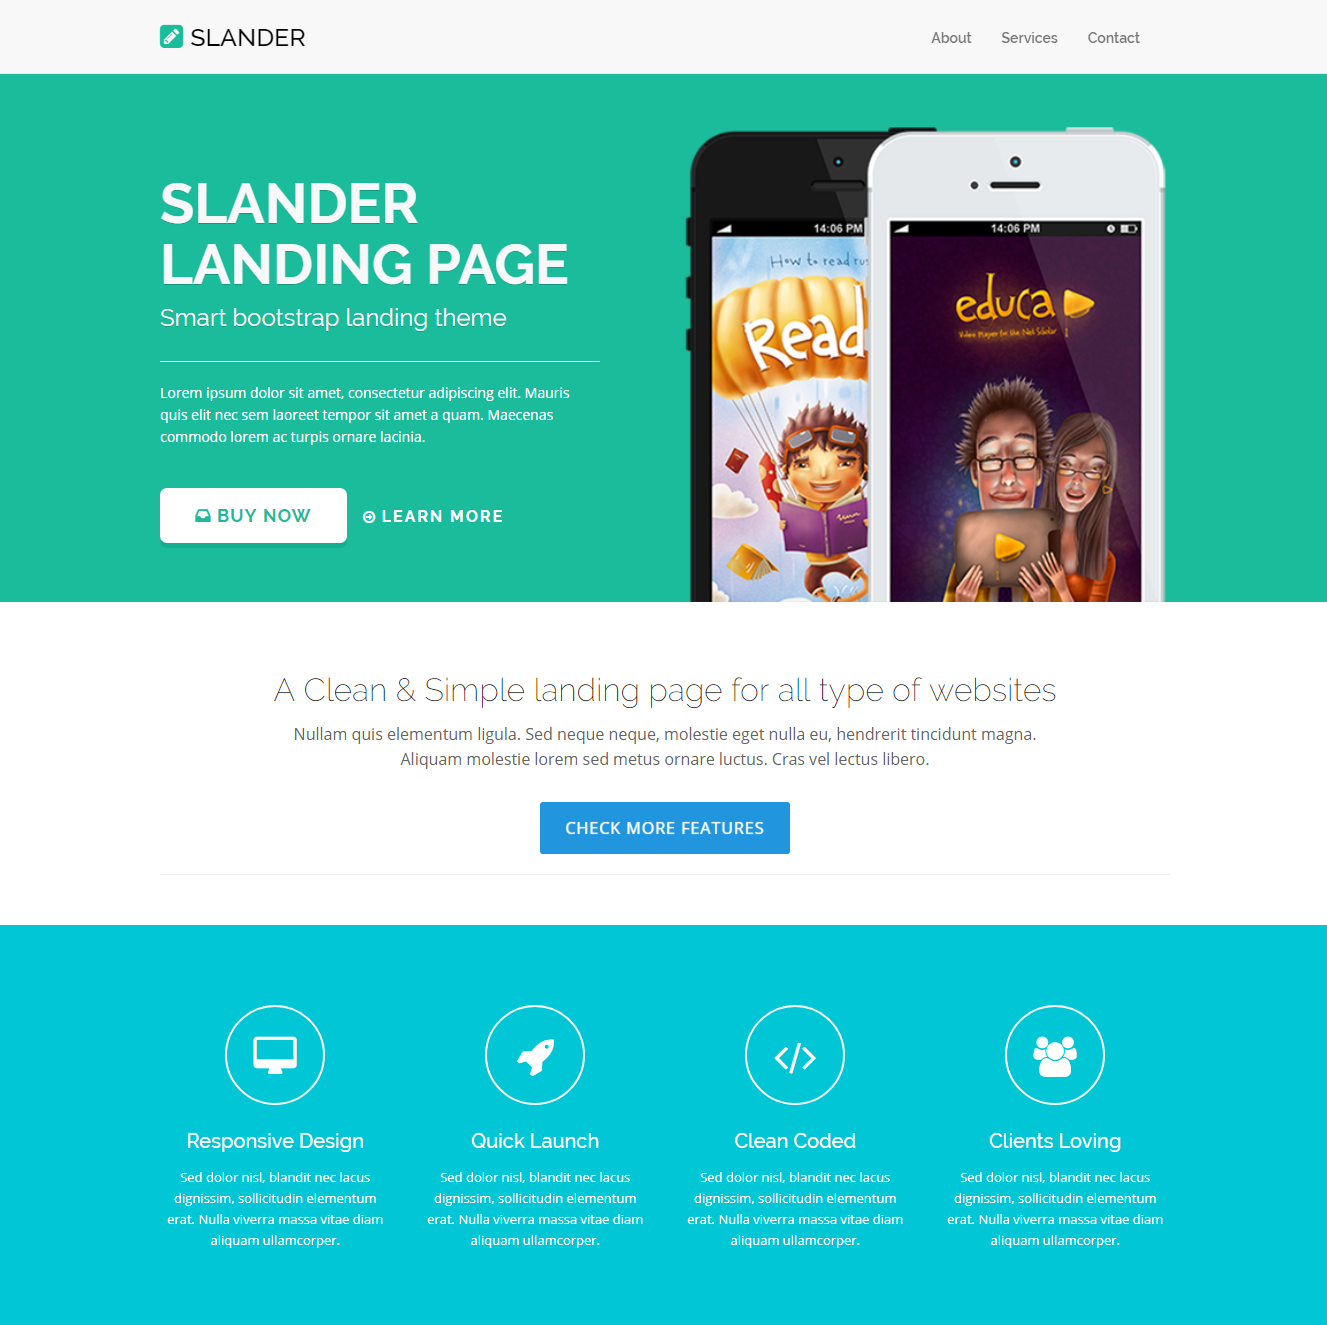 HTML Bootstrap Slander Themes